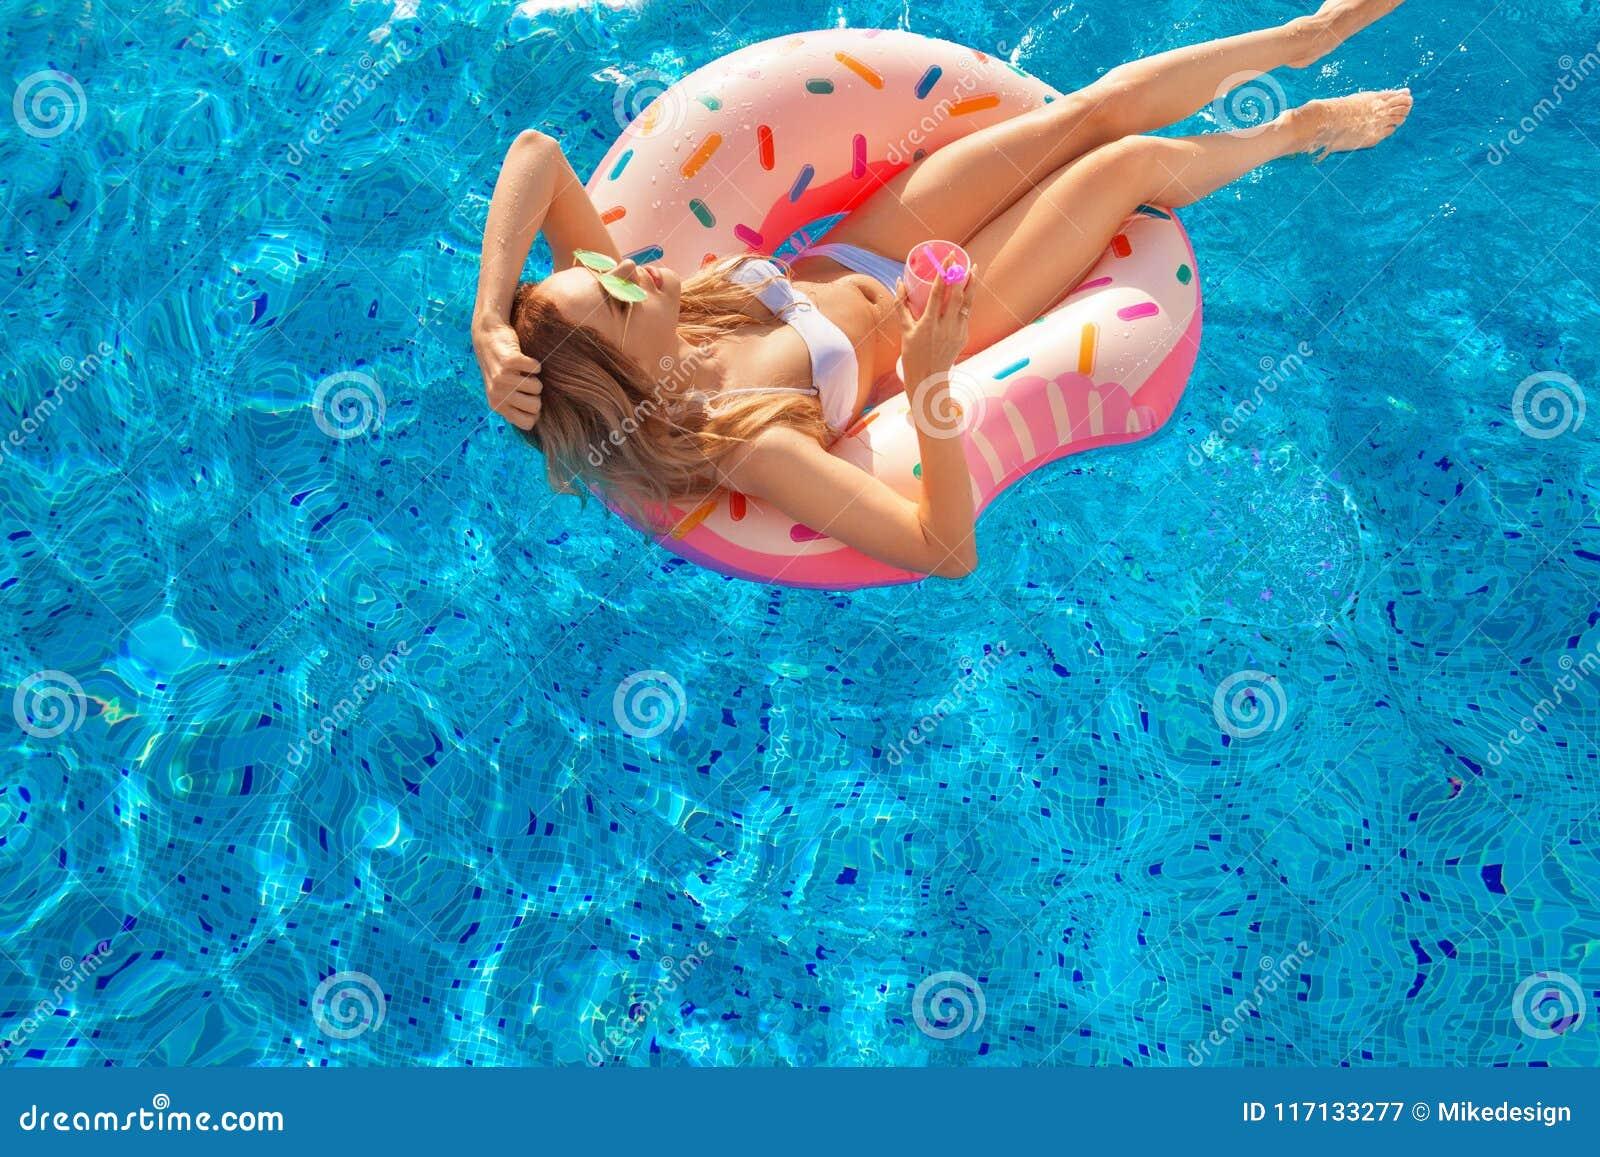 Katya krasnodar夏天领土假期 比基尼泳装的妇女在温泉游泳池的可膨胀的多福饼床垫 在蓝色海的海滩